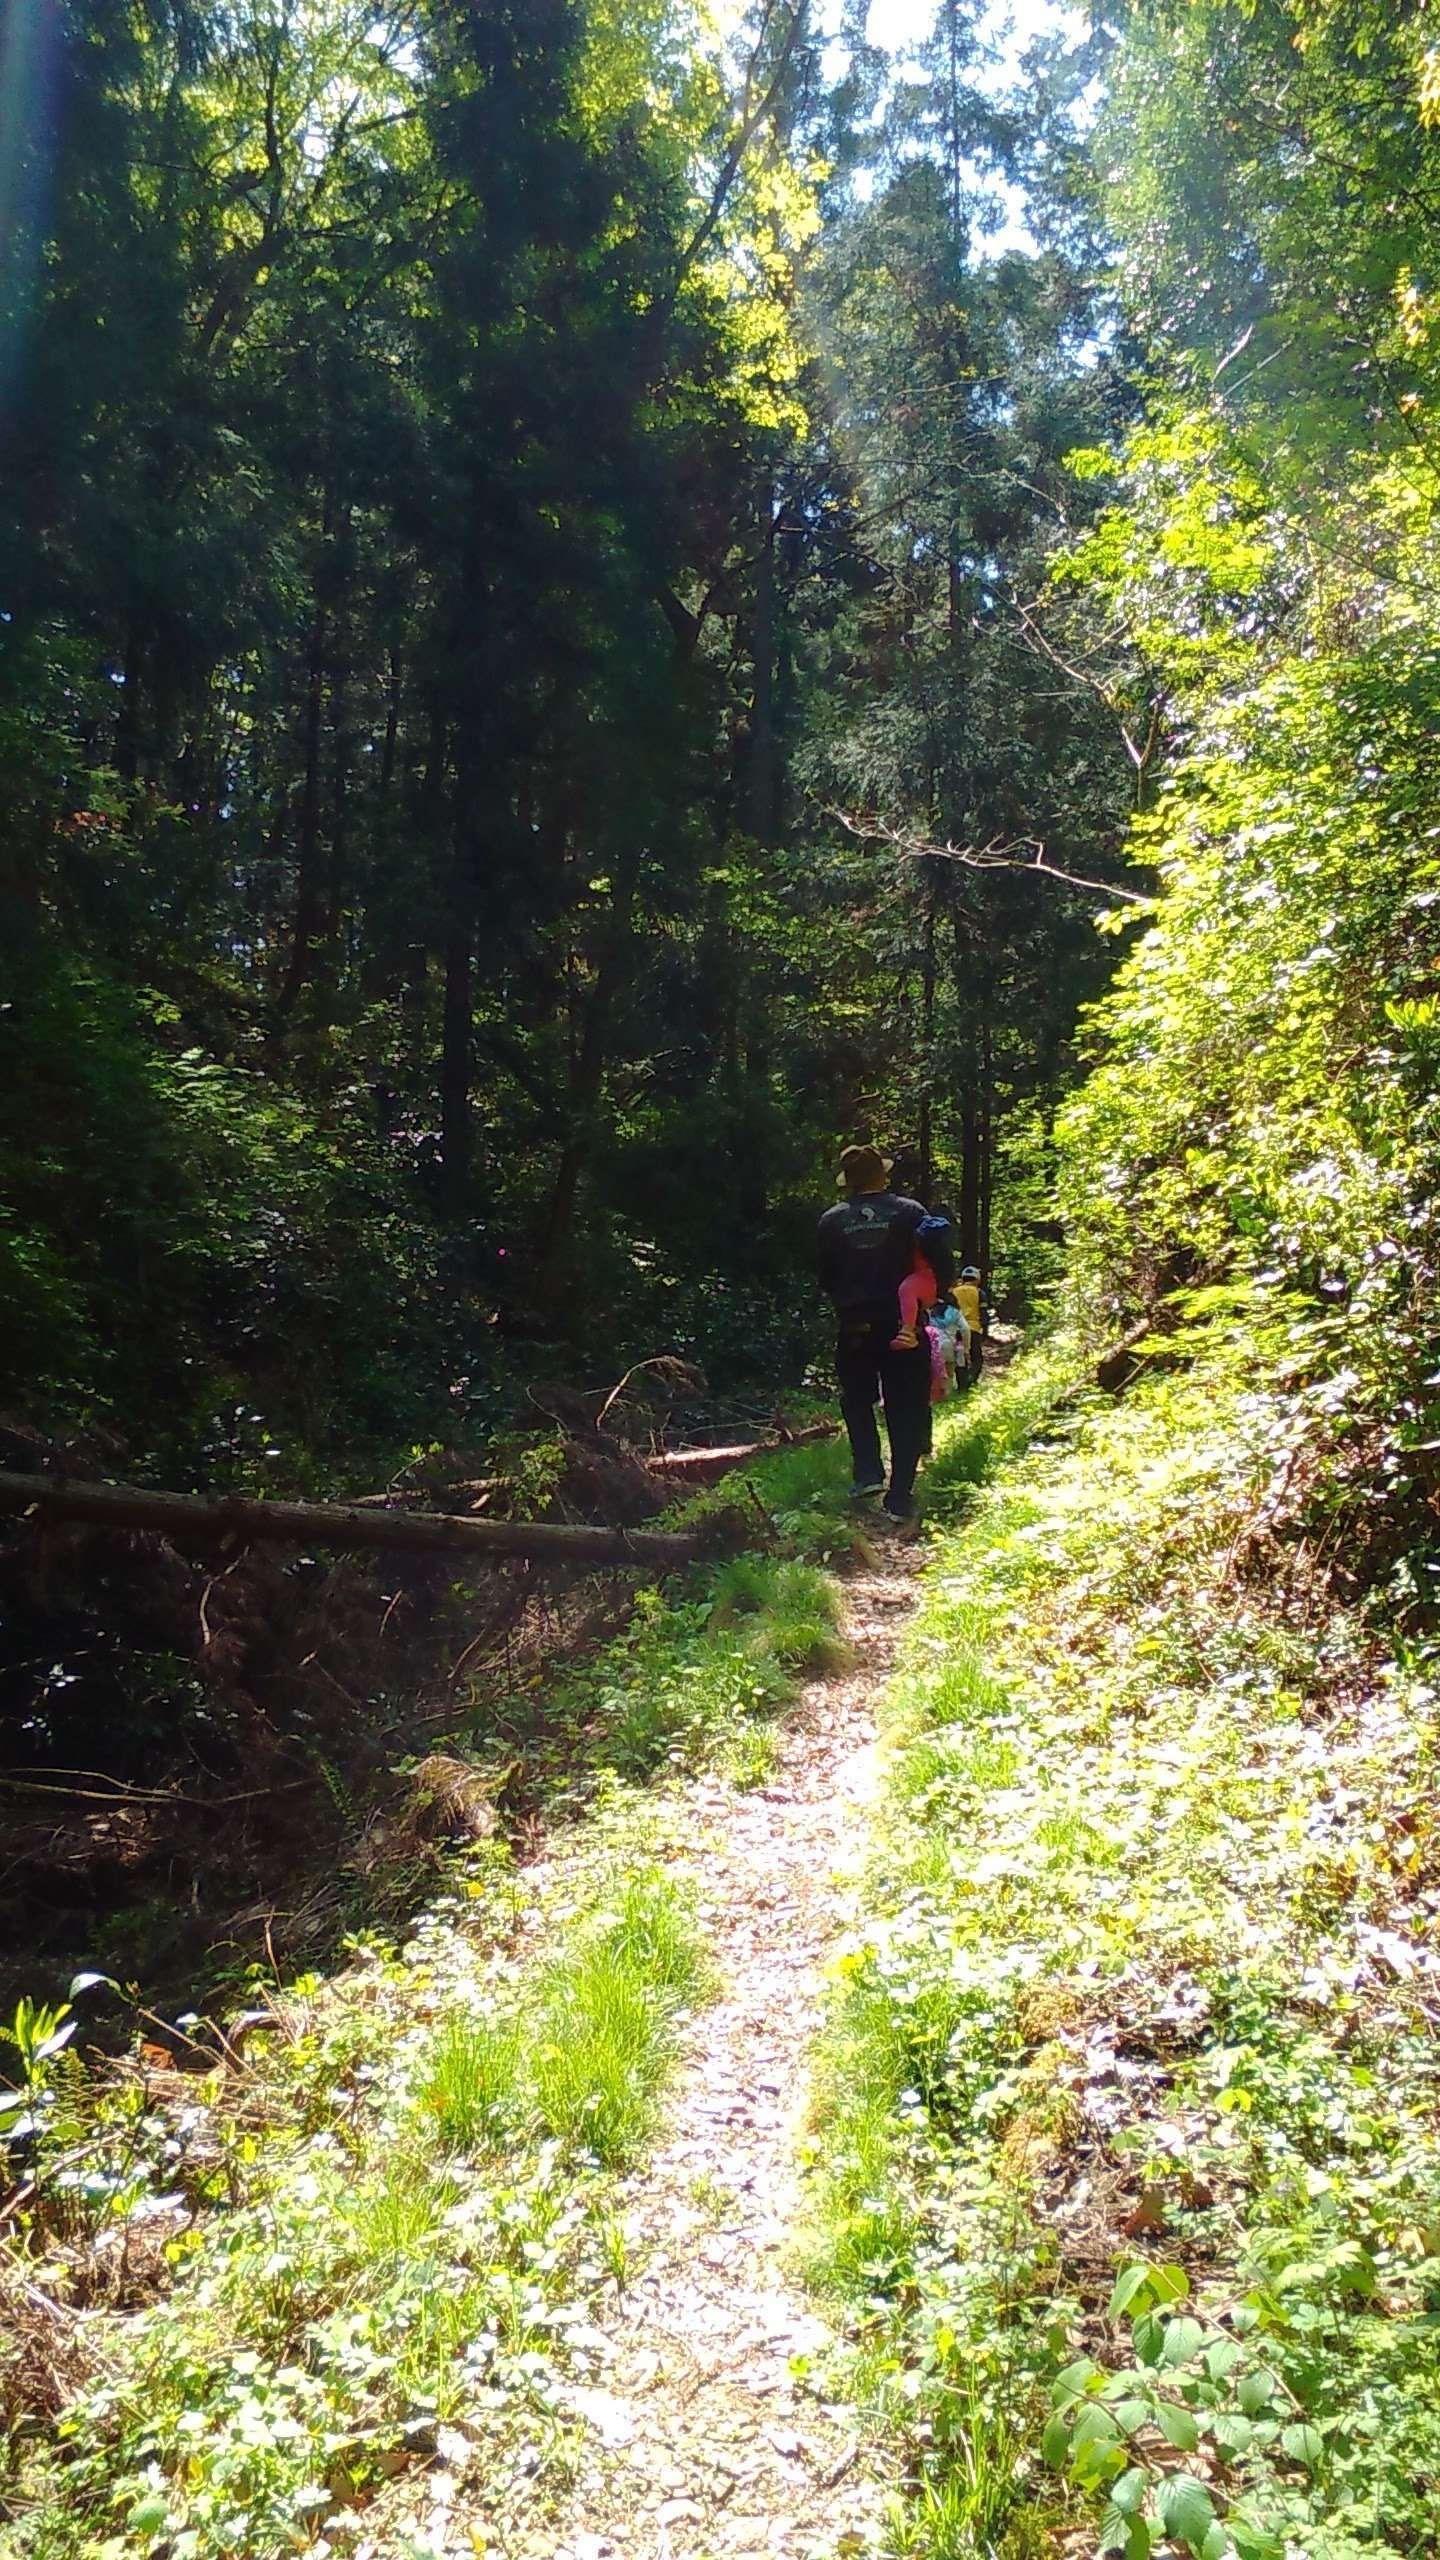 off the beaten path hiking trail to the shibazakura no oka moss phlox fields in chichibu Saitama